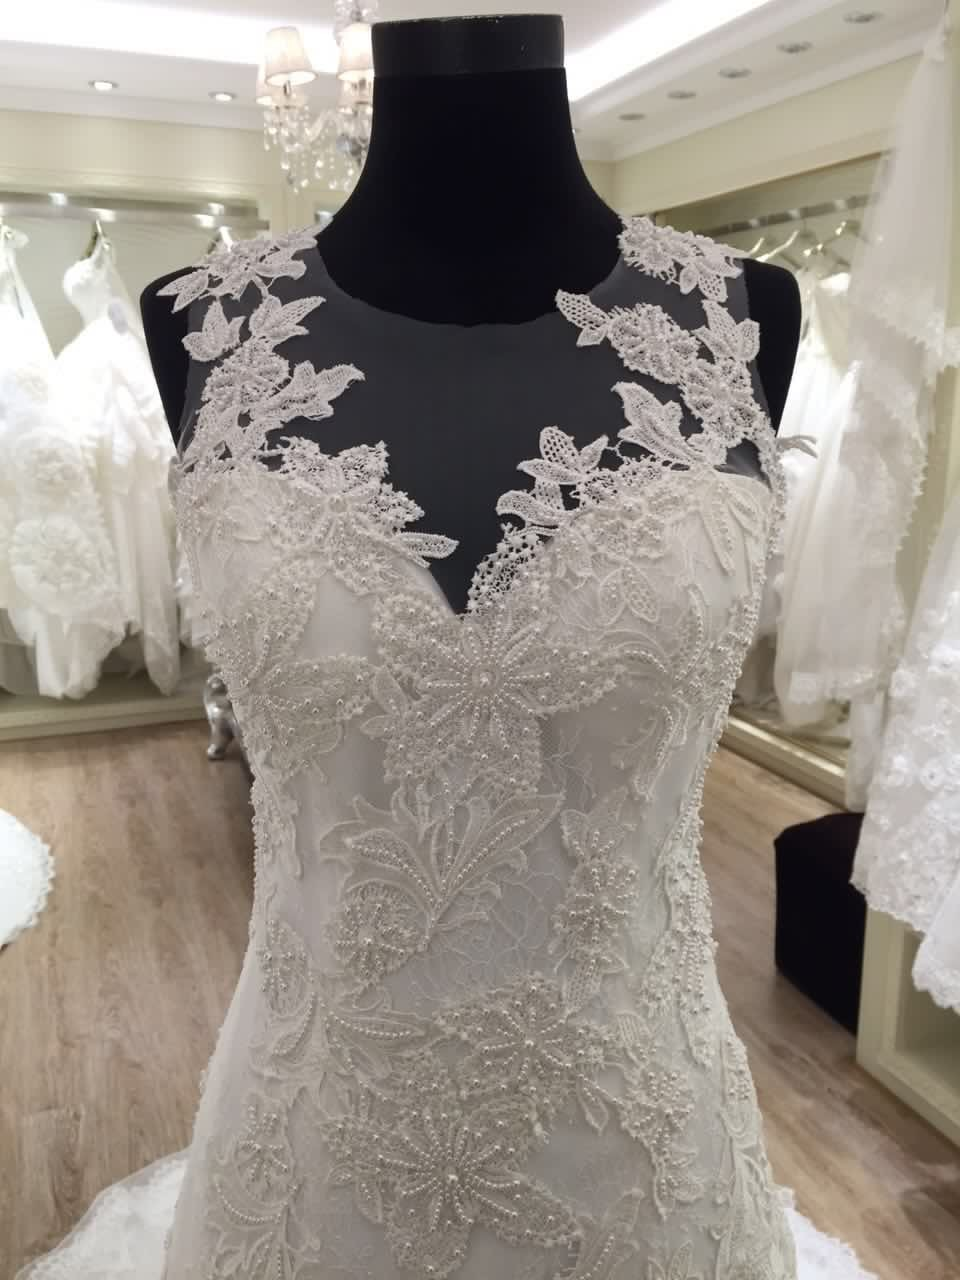 2016 Spanish Style Lace Wedding Dresses Made In China - Buy Spanish ...